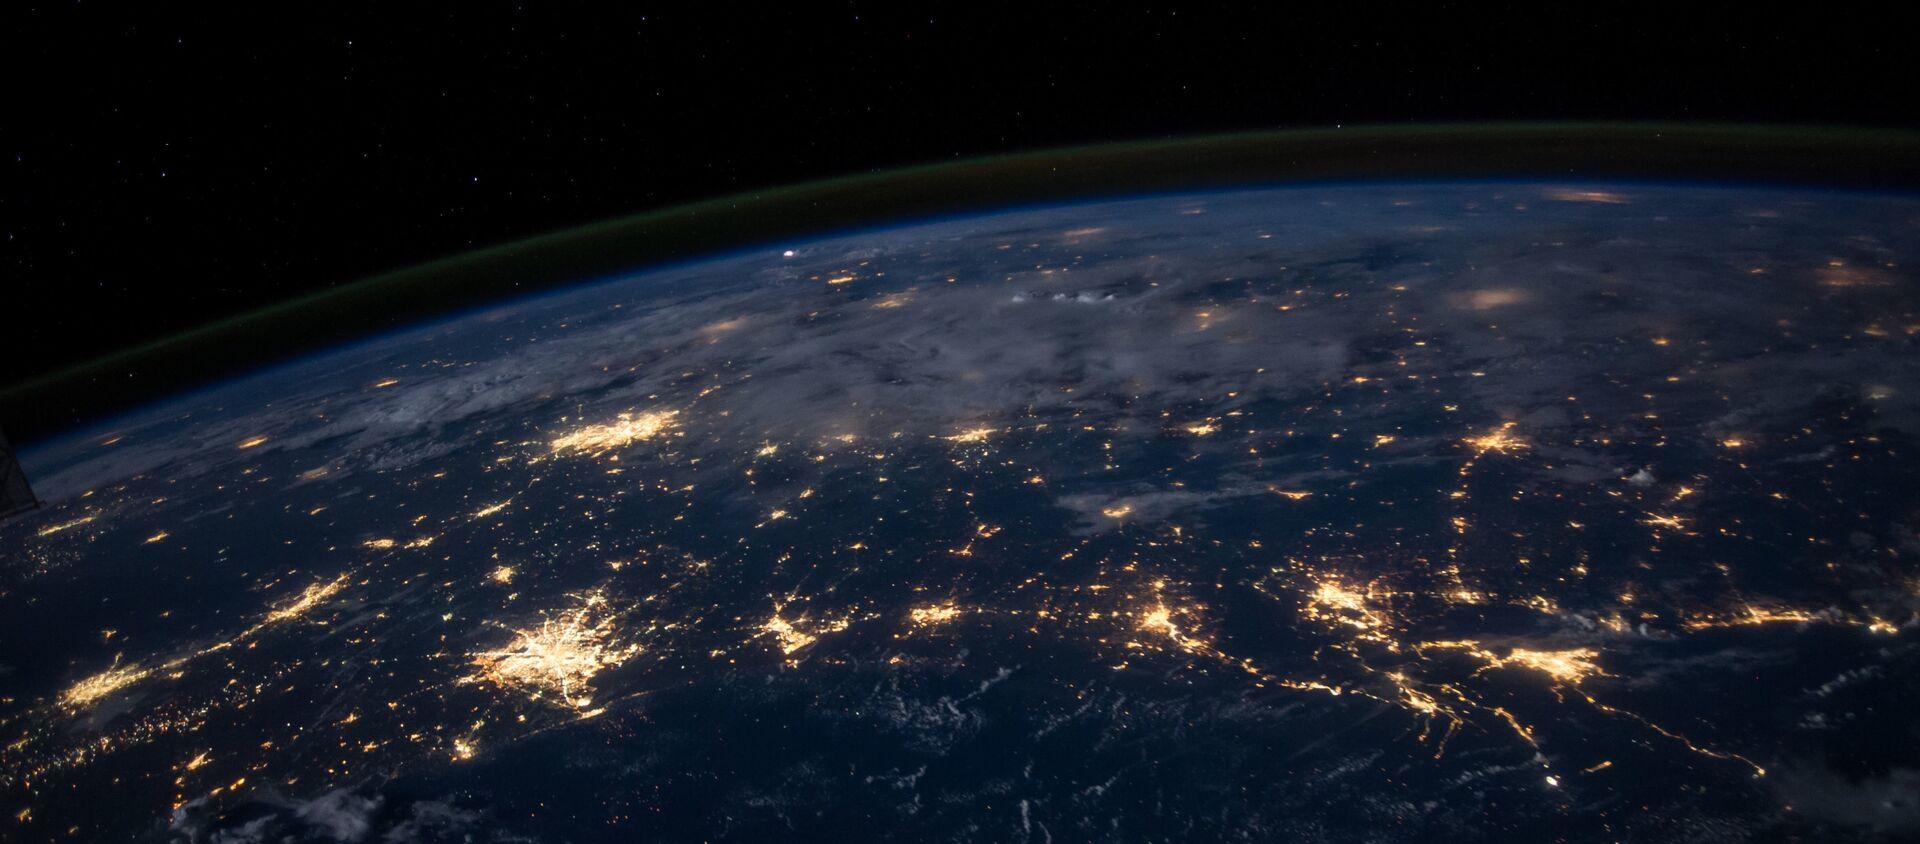 La Tierra (imagen referencial) - Sputnik Mundo, 1920, 09.01.2021